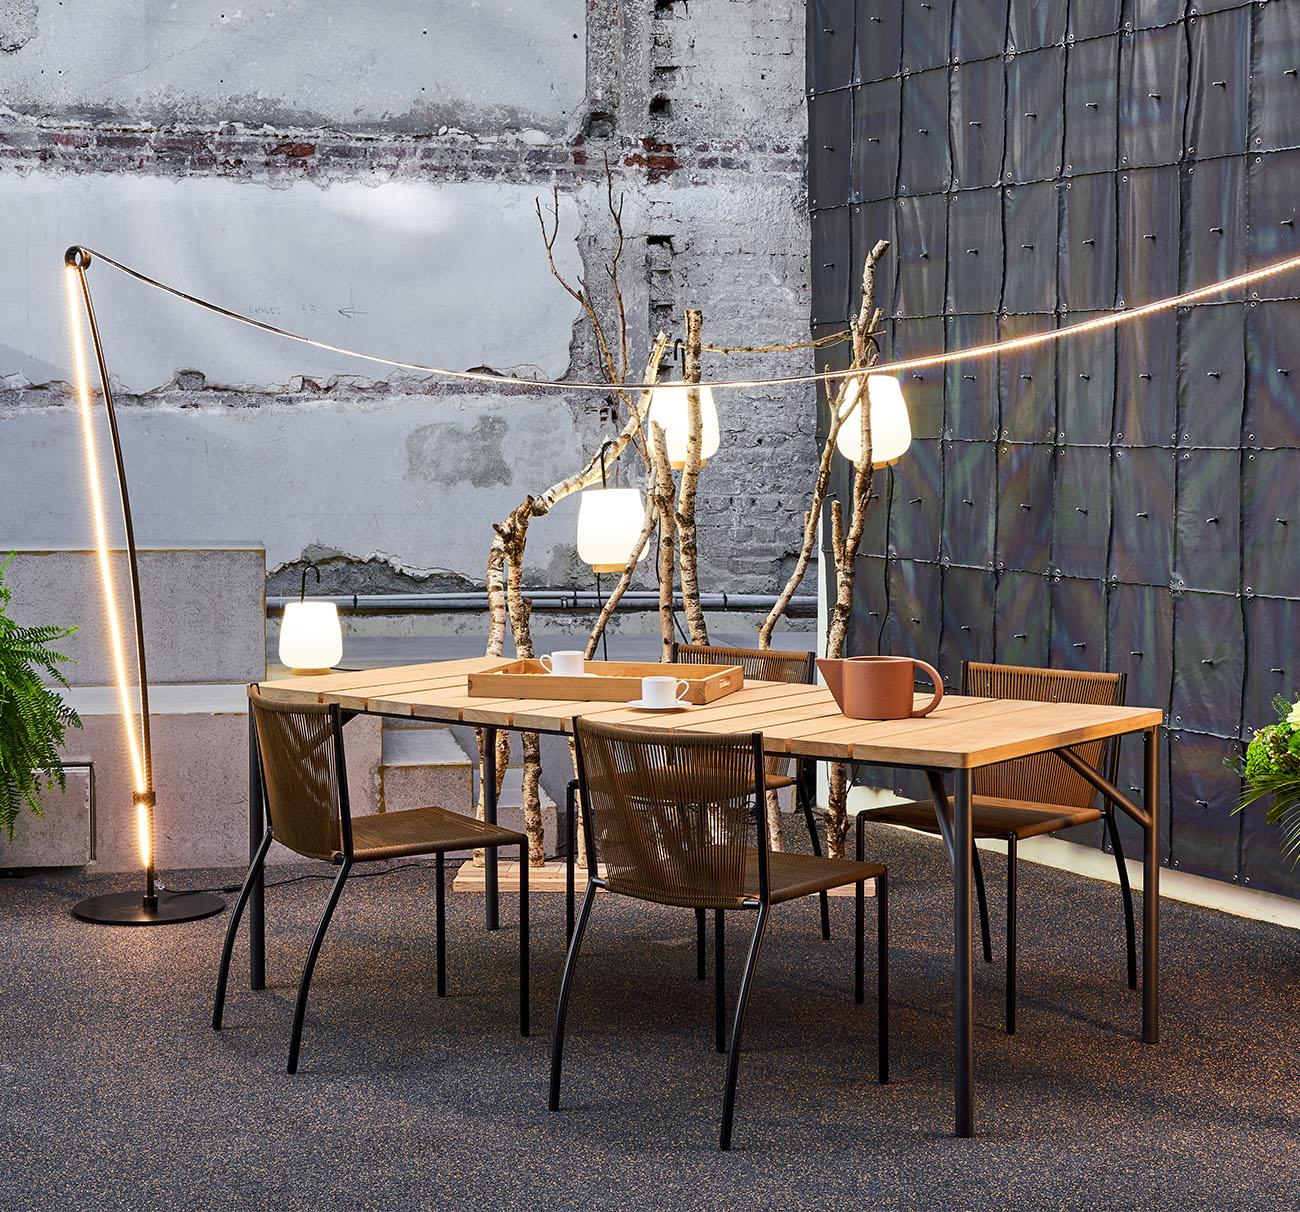 Lapel-table_BusettiGarutiRedaelli_LigneRoset_02